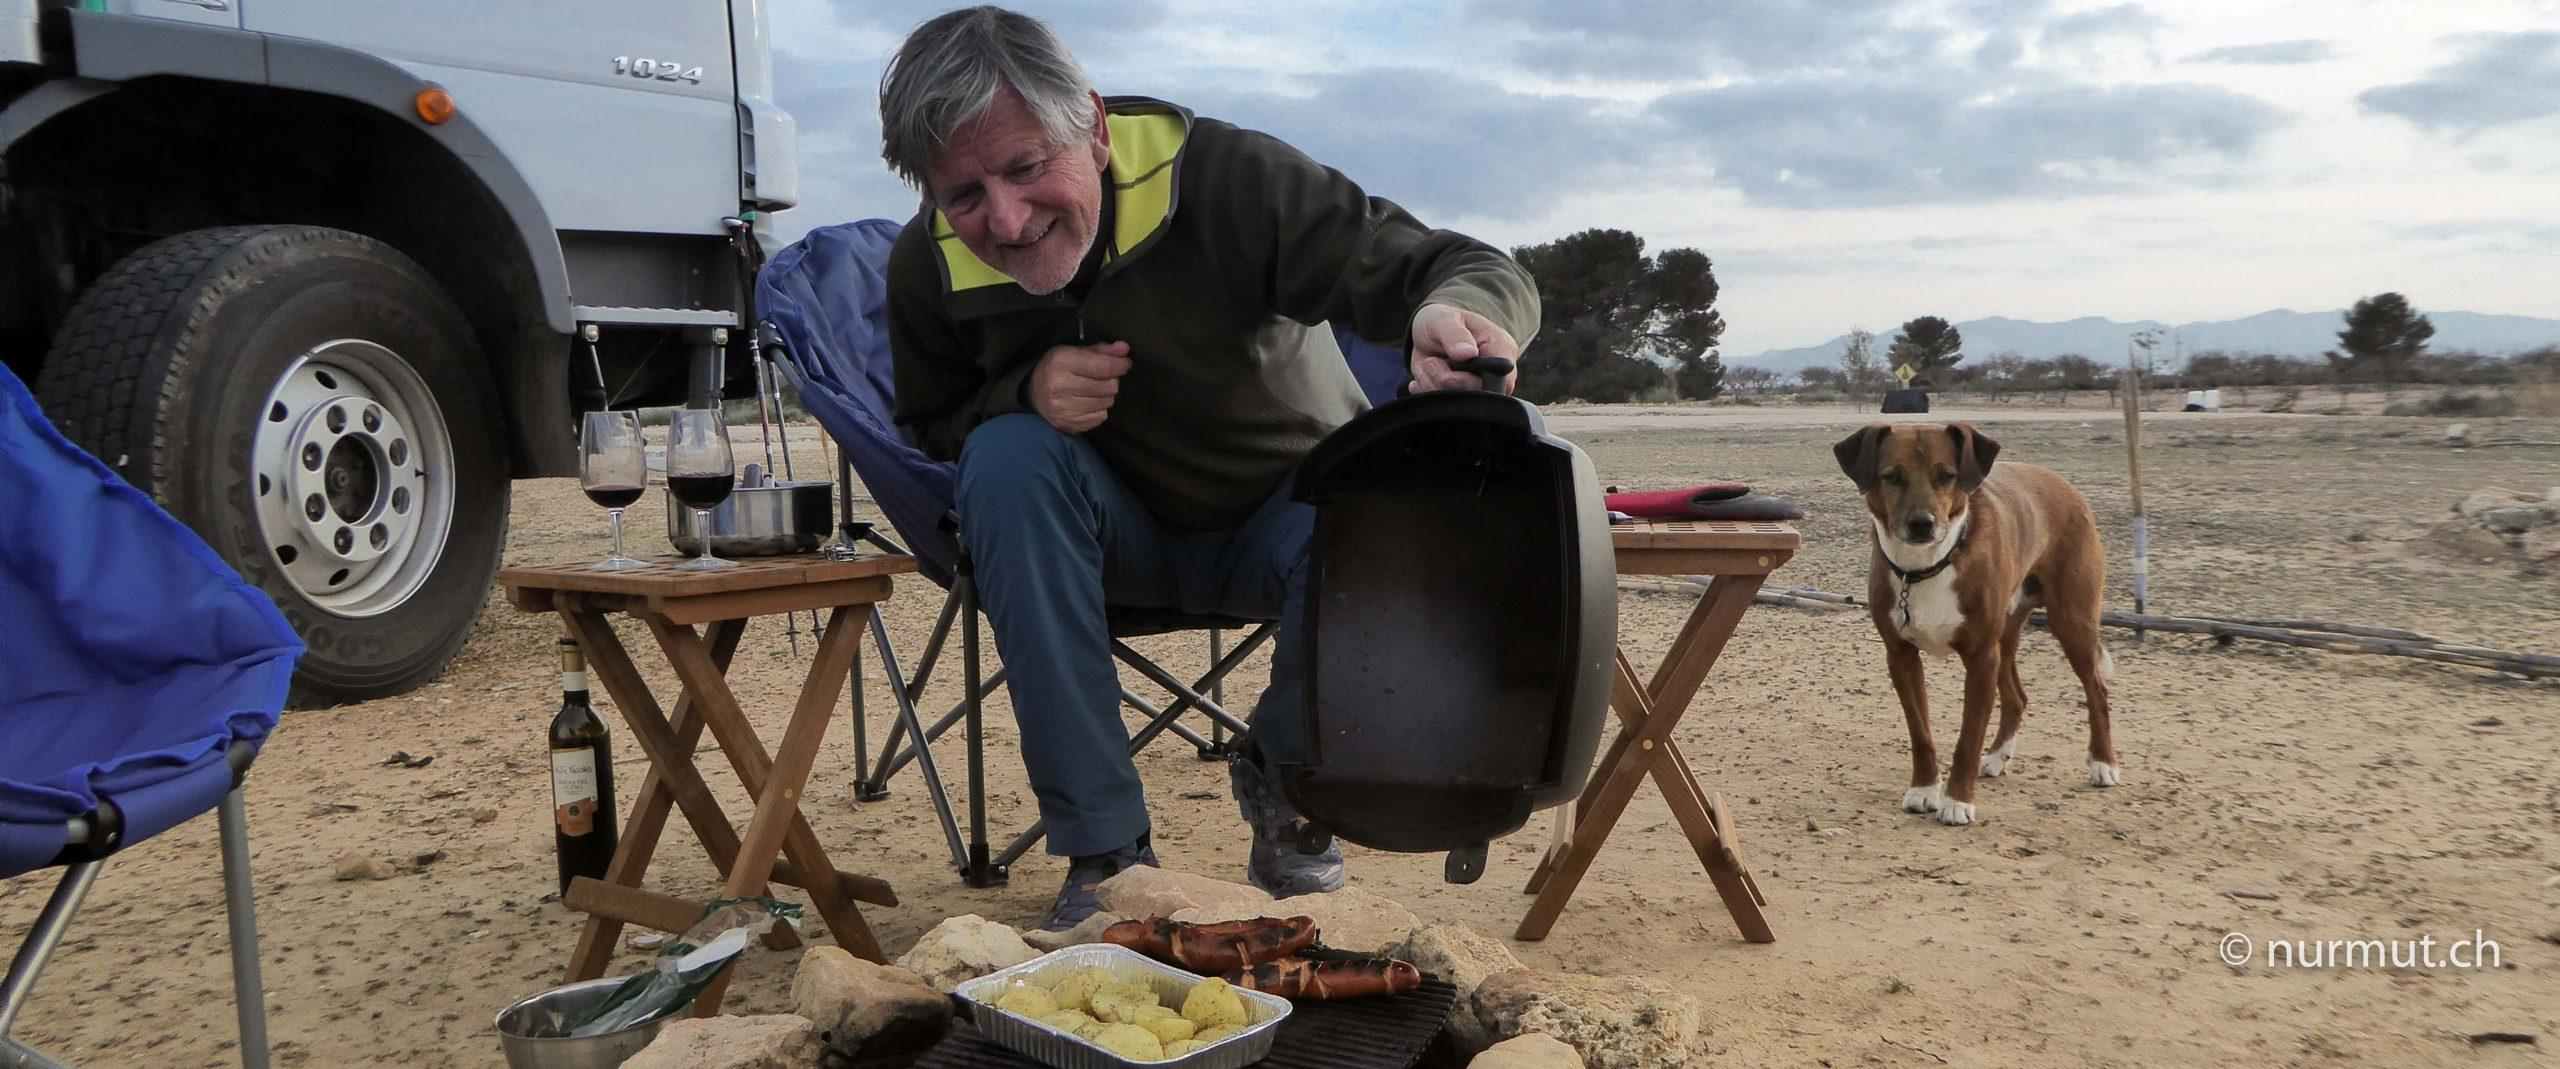 spanien-la-mancha-finca-caravana-camping